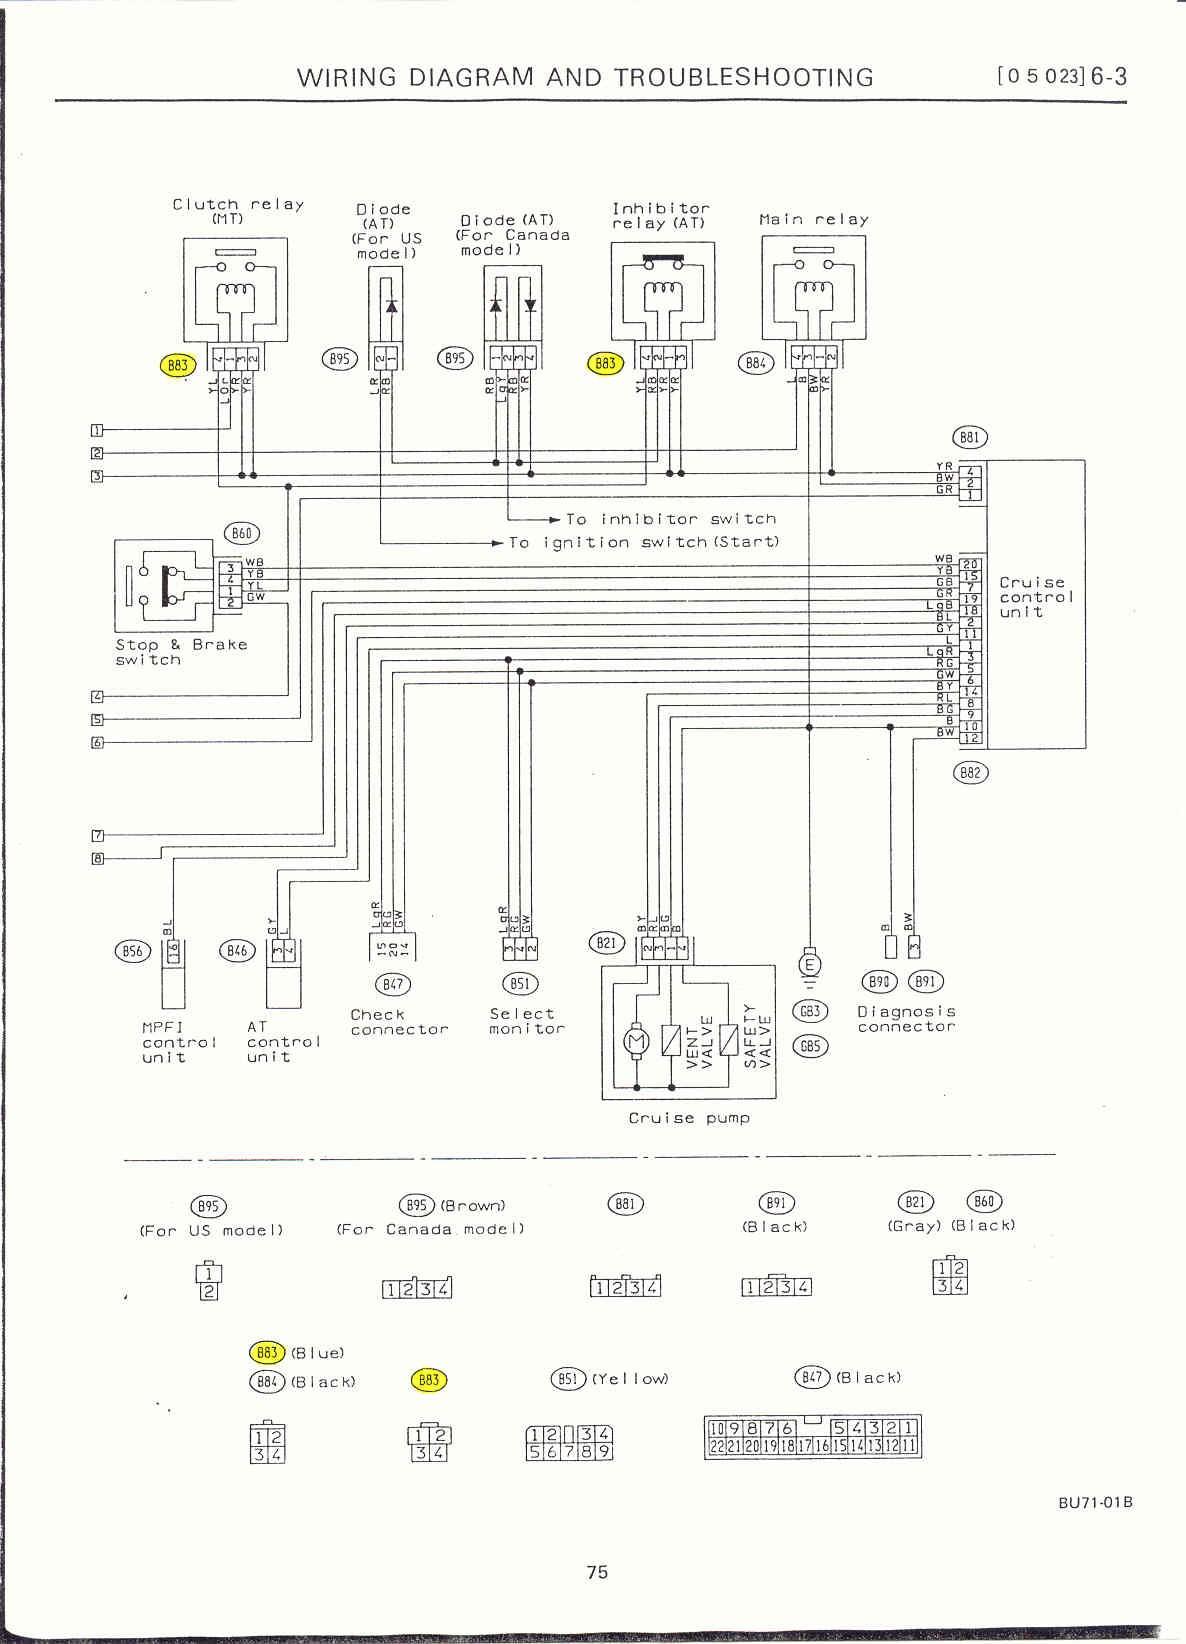 subaru engine diagram 25 wiring diagrams Subaru WRX Wiring Diagram